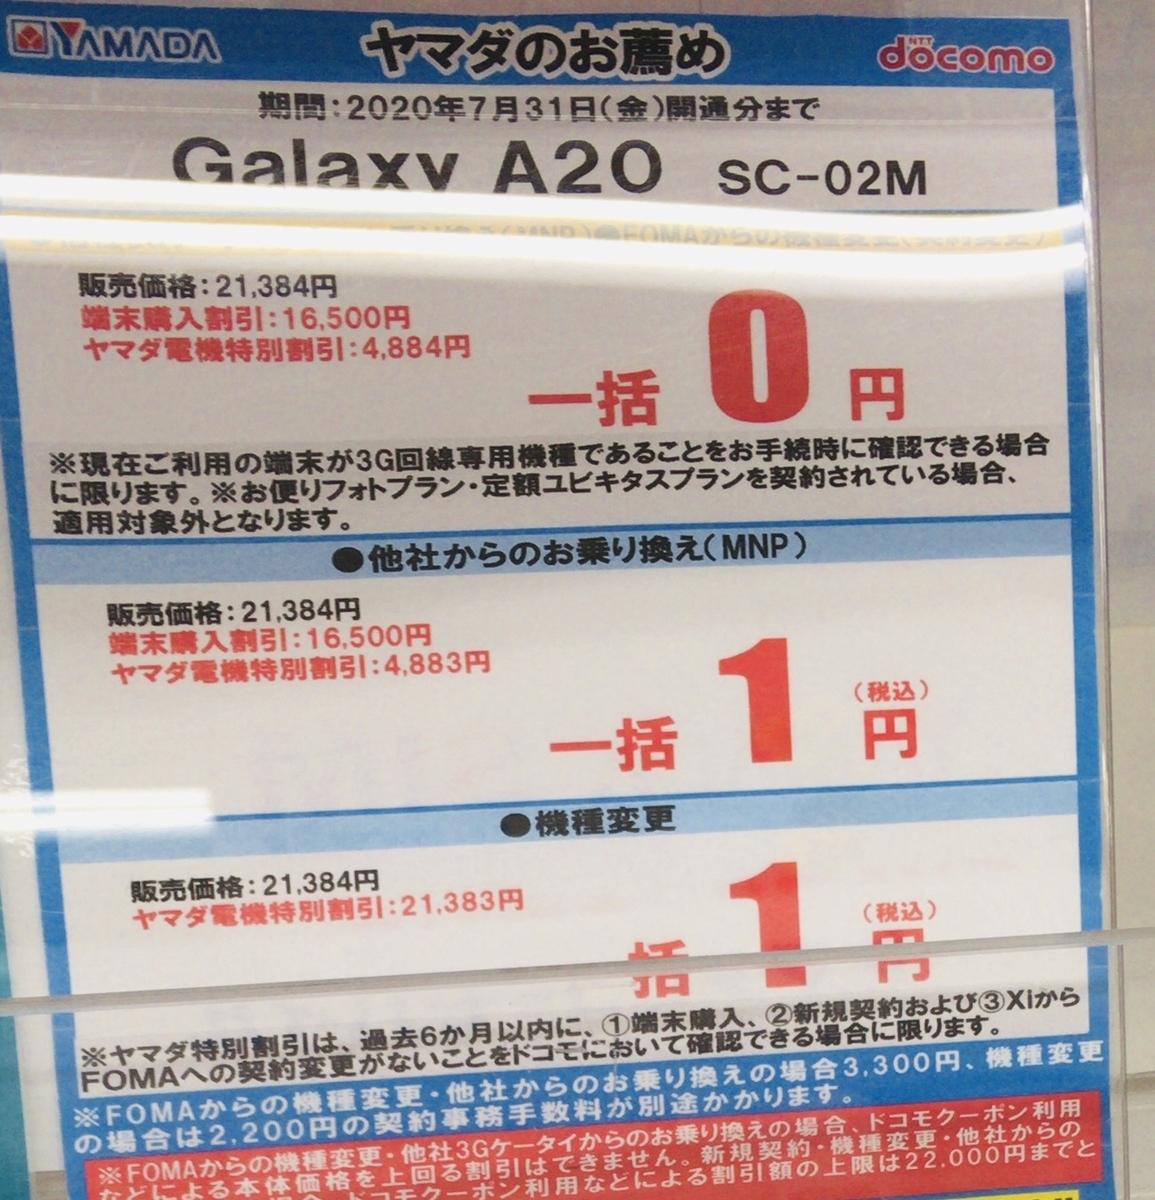 f:id:koiwai_chinatsu:20200725174317j:plain